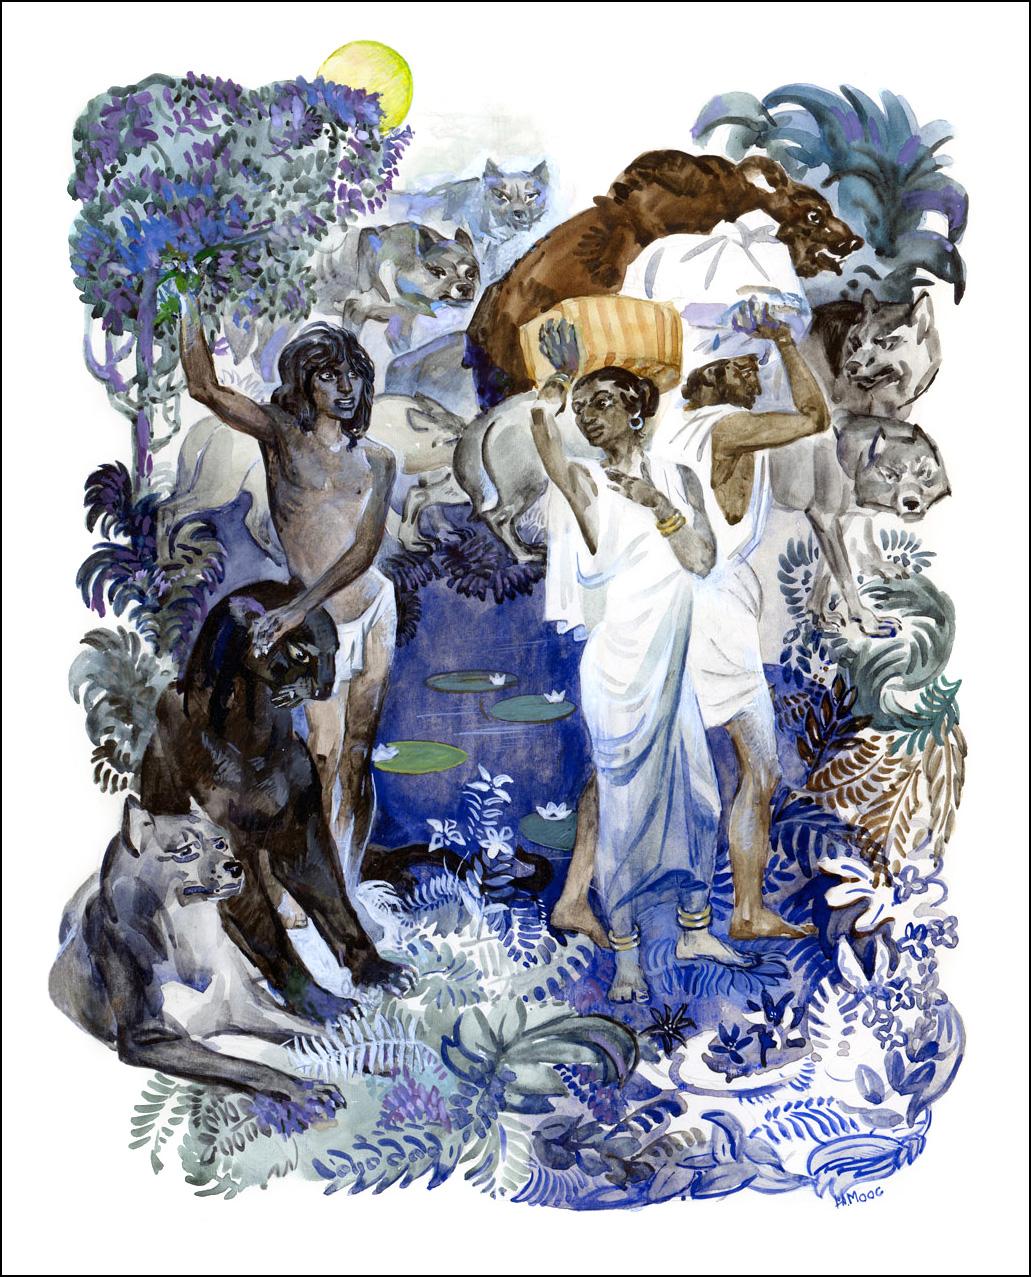 иллюстратор Н. Моос, Джозеф Редьярд Киплинг, Маугли.